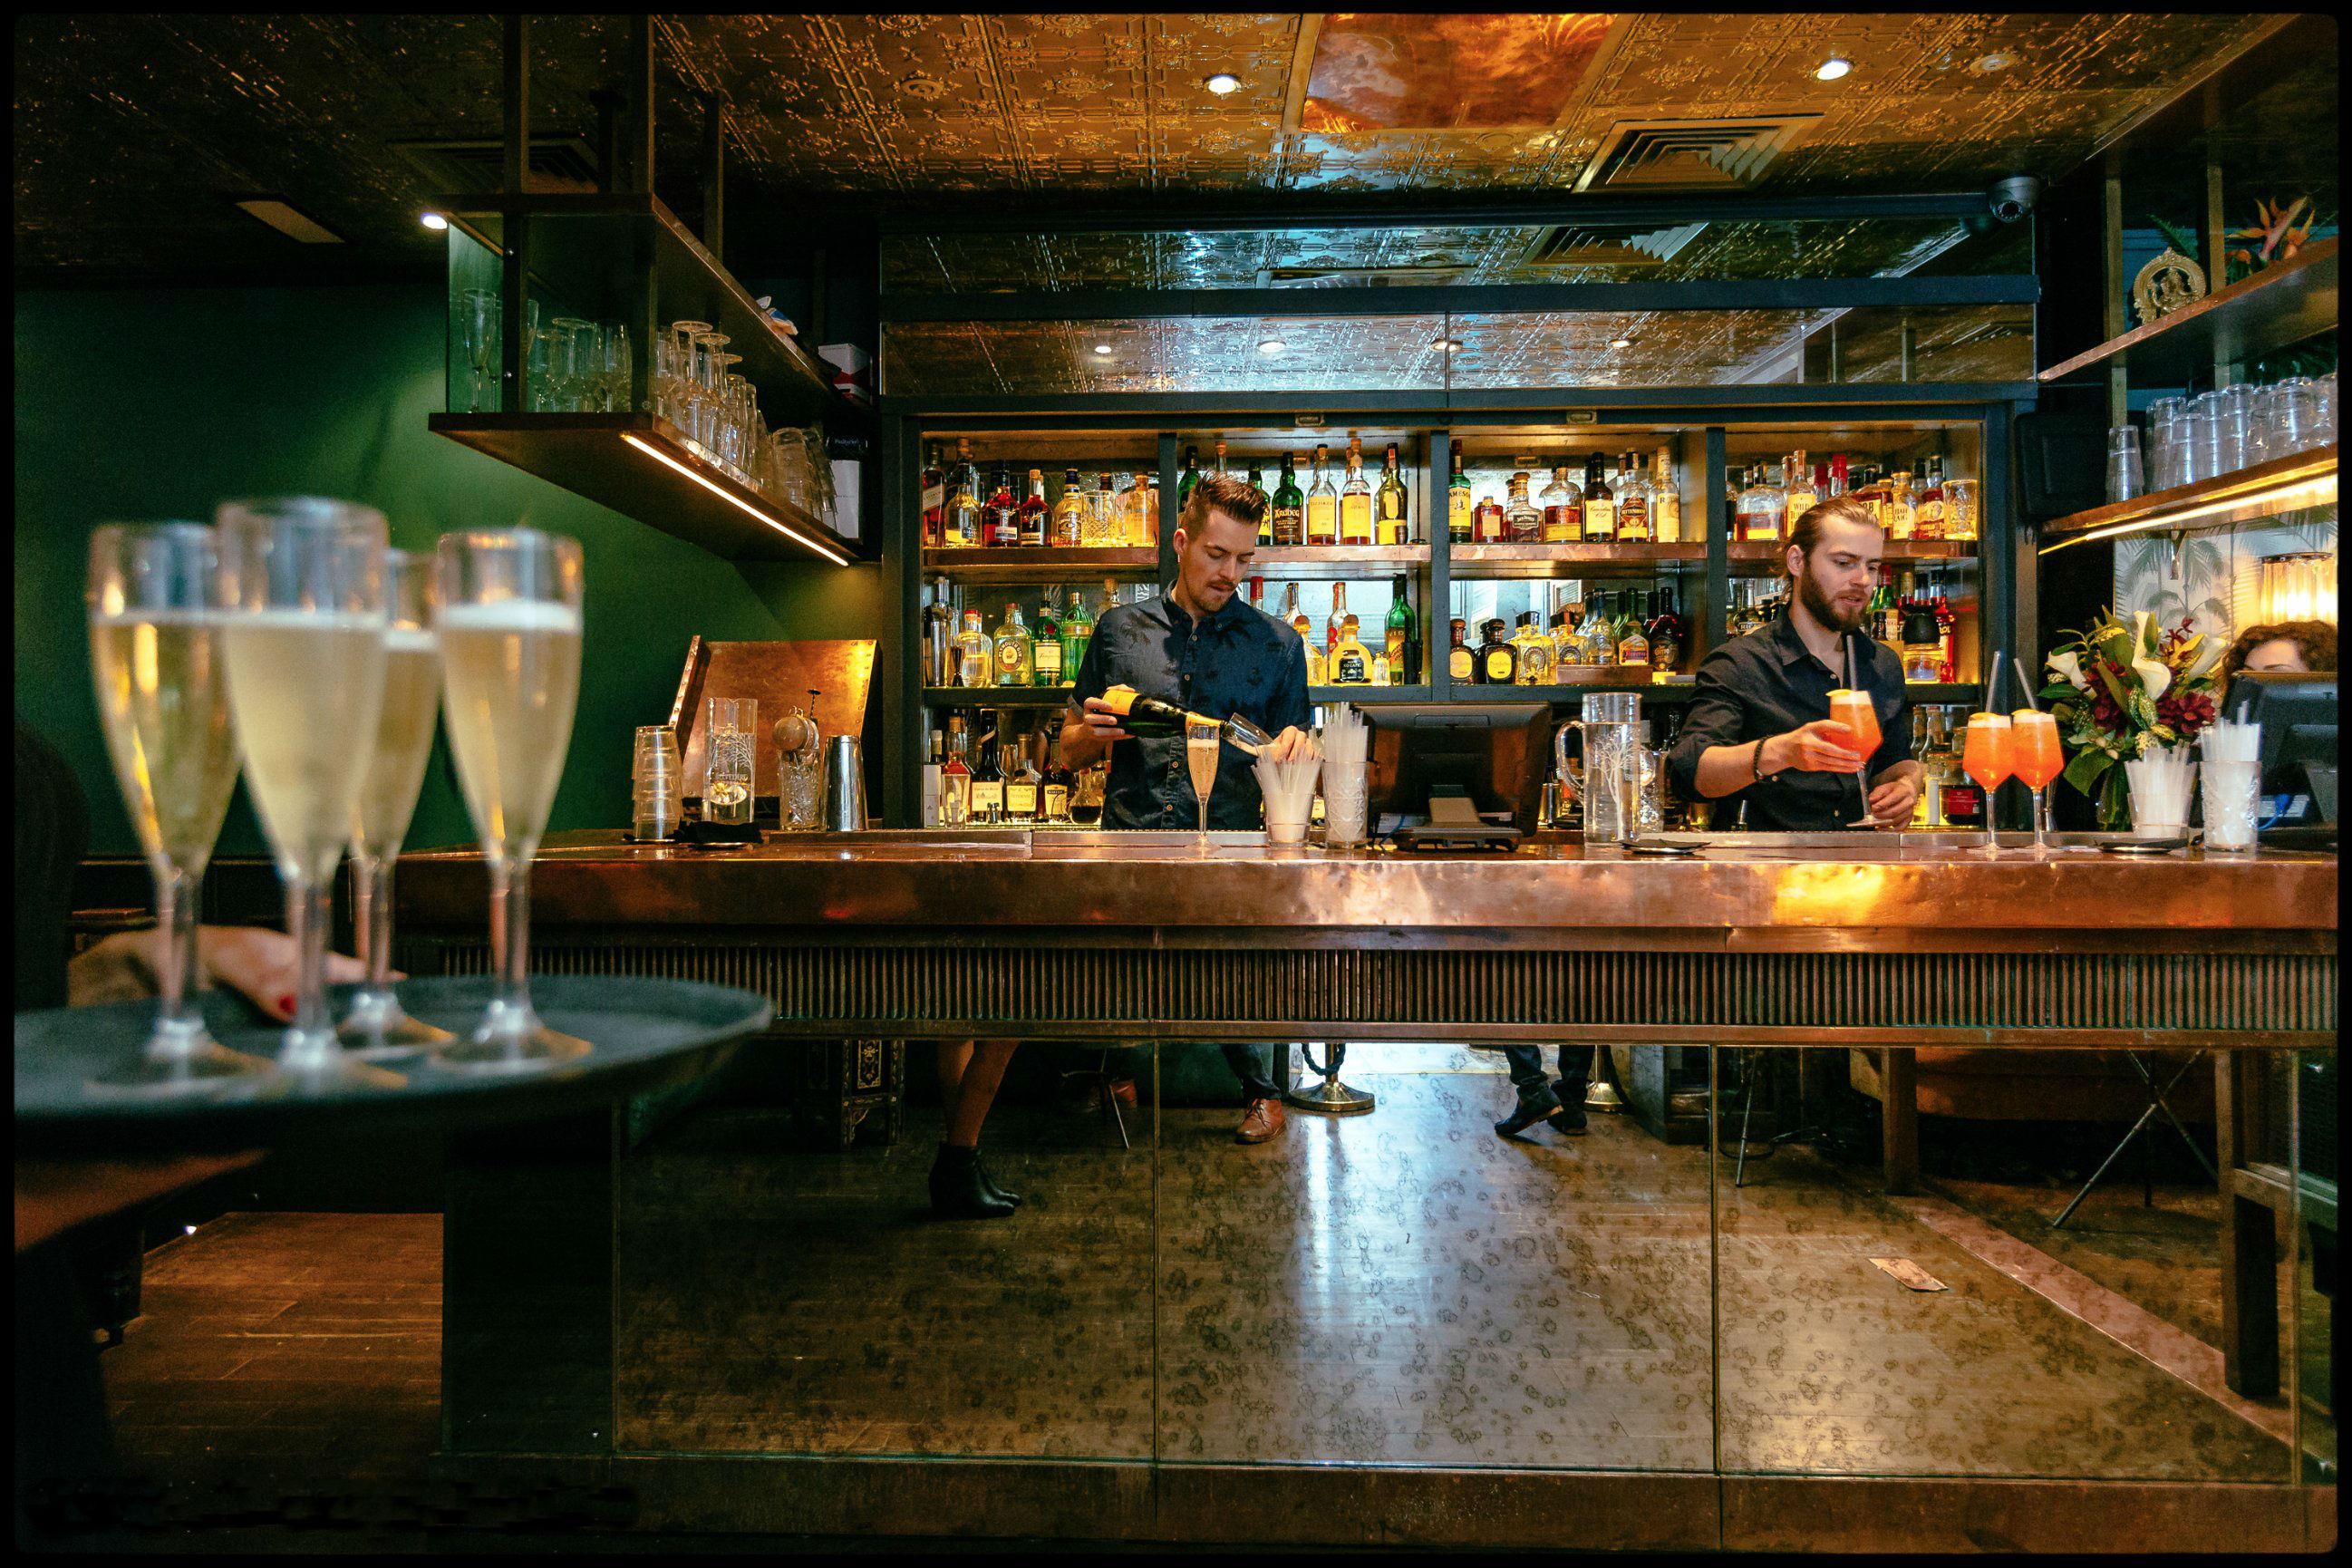 Scotch of St James bar